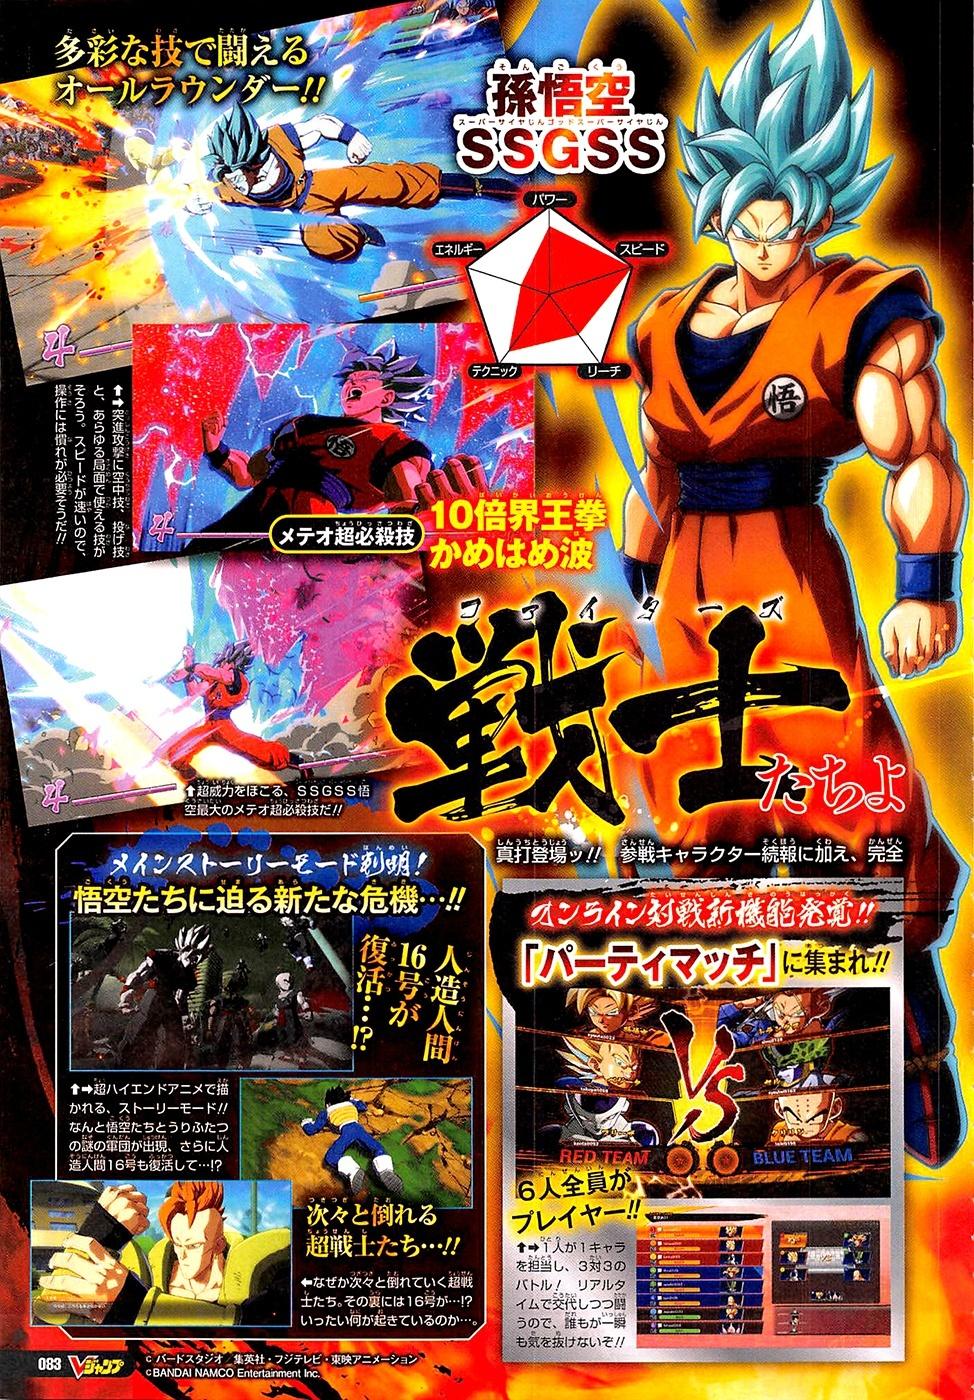 Dragon-Ball-Fighters-V-Jump_08-17-17_002.jpg